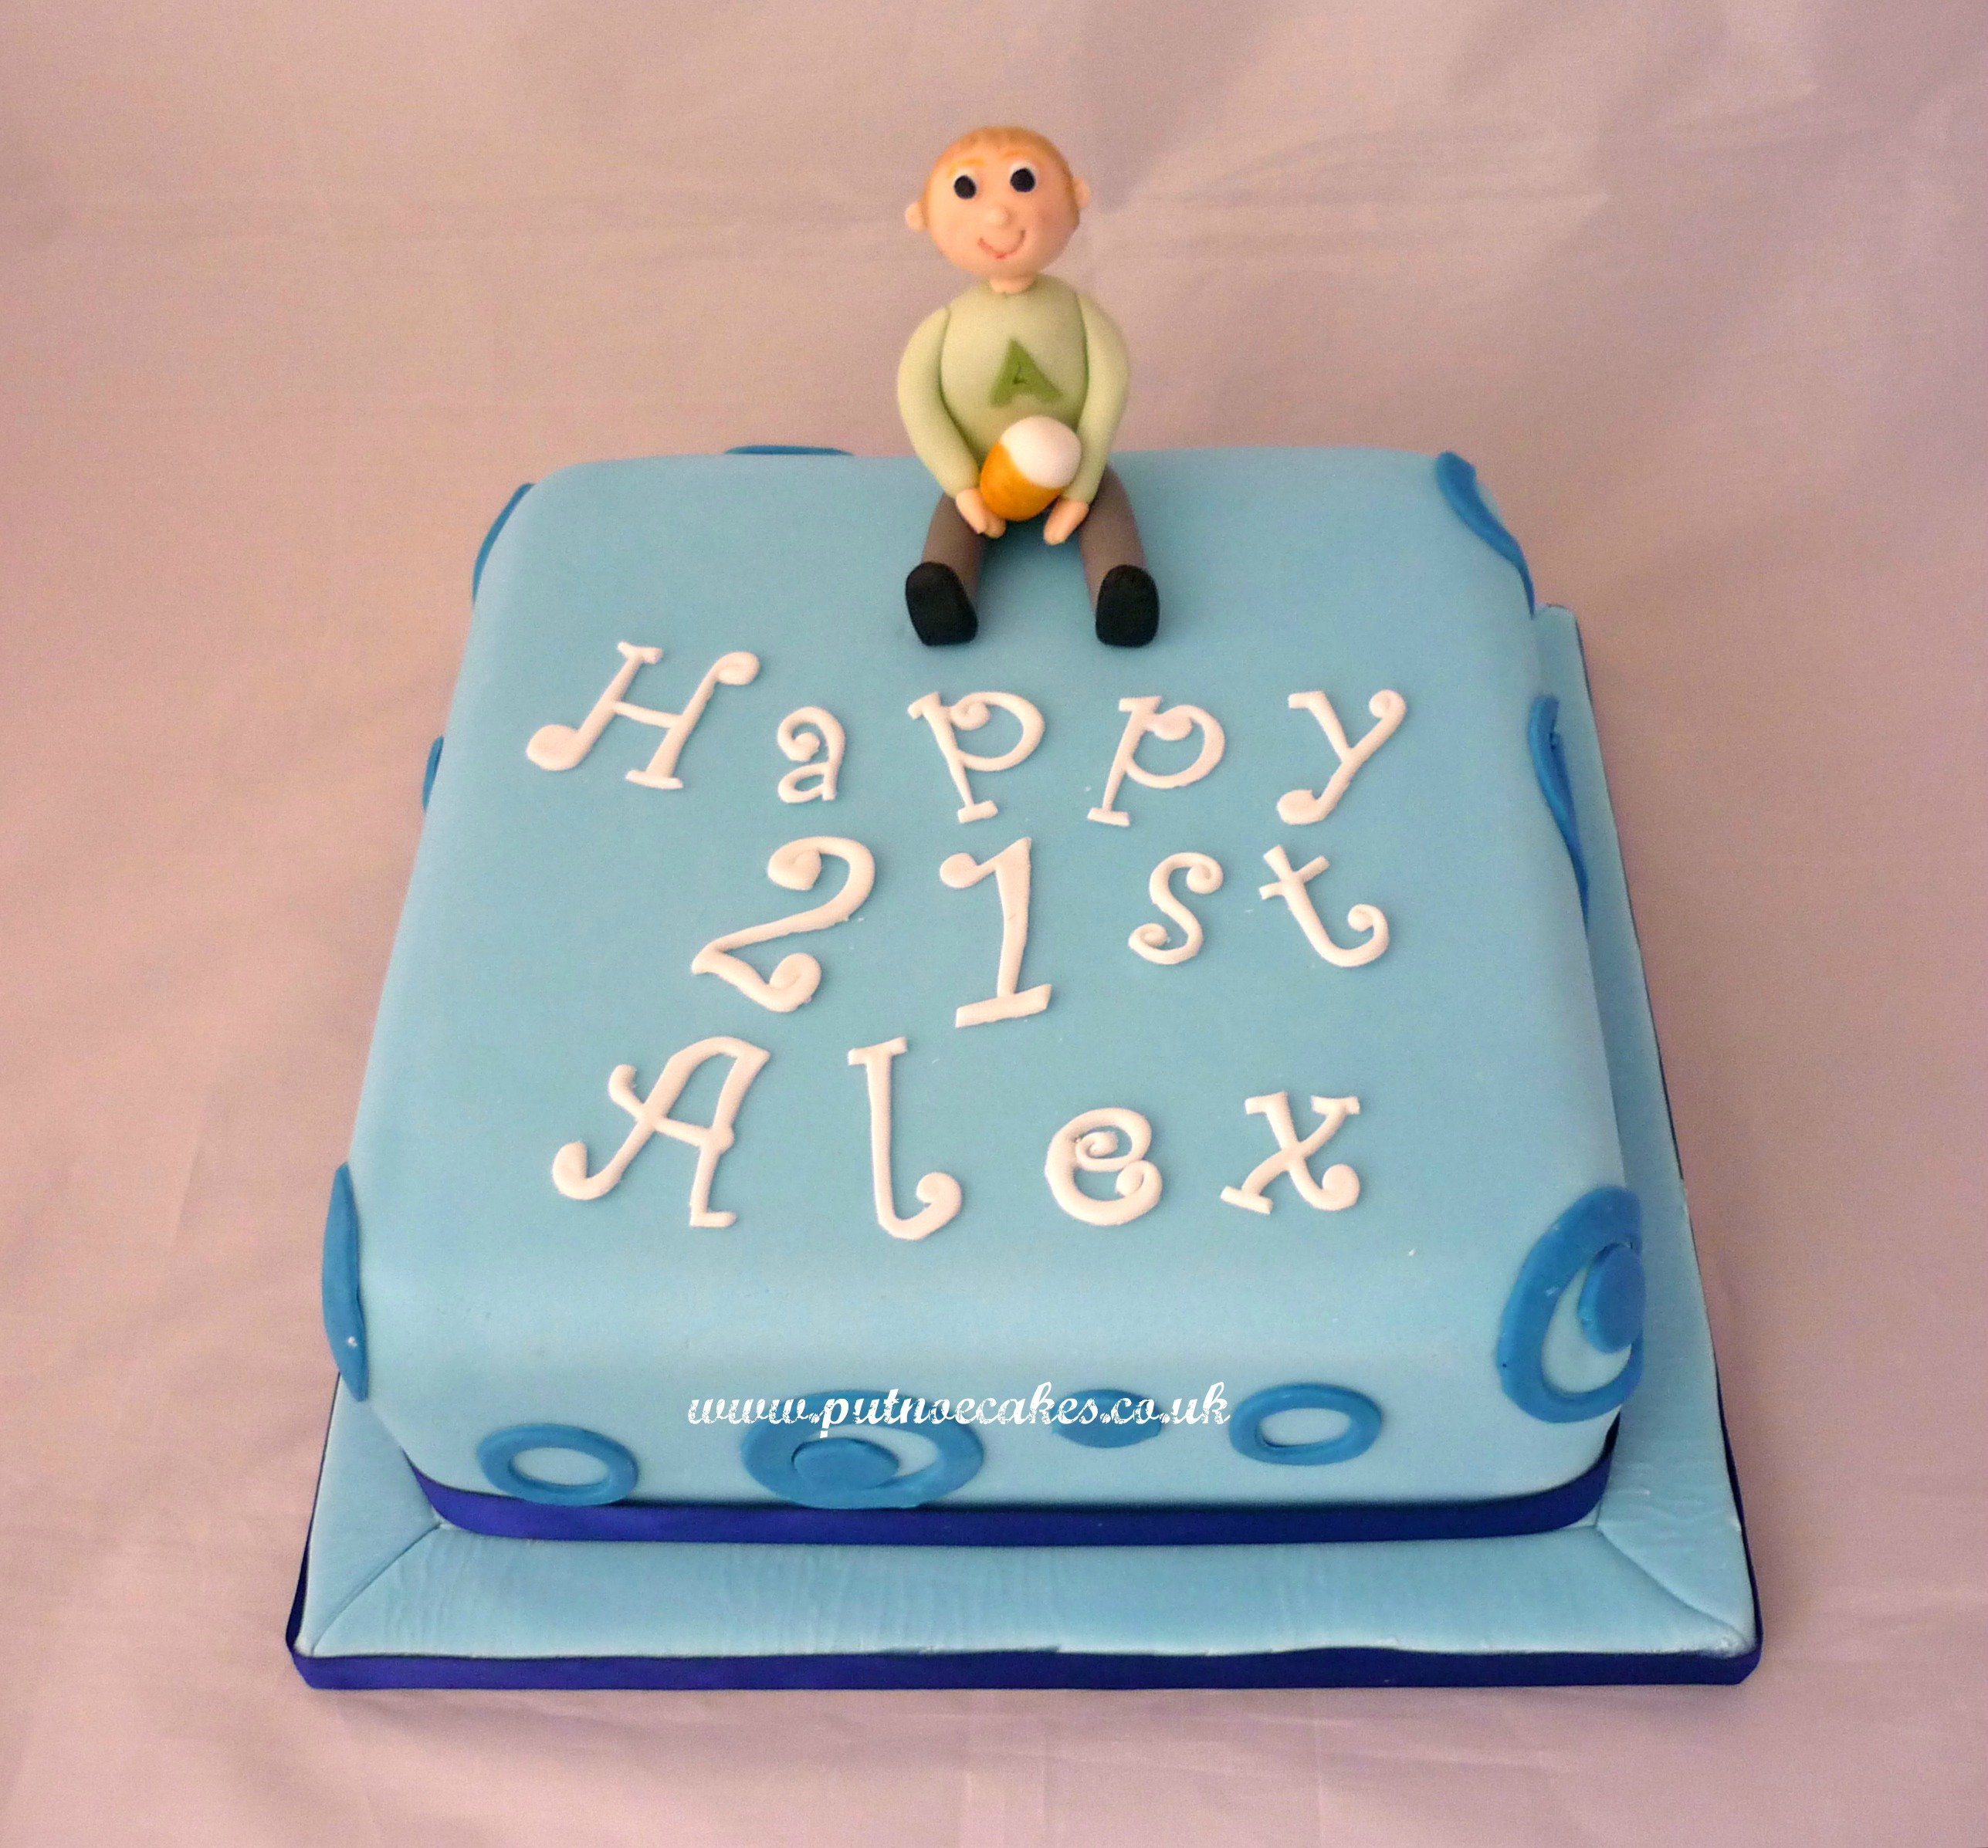 Pleasing 12 21 Birthday Cakes For Guys Photo 21 Birthday Cake Ideas Men Personalised Birthday Cards Epsylily Jamesorg